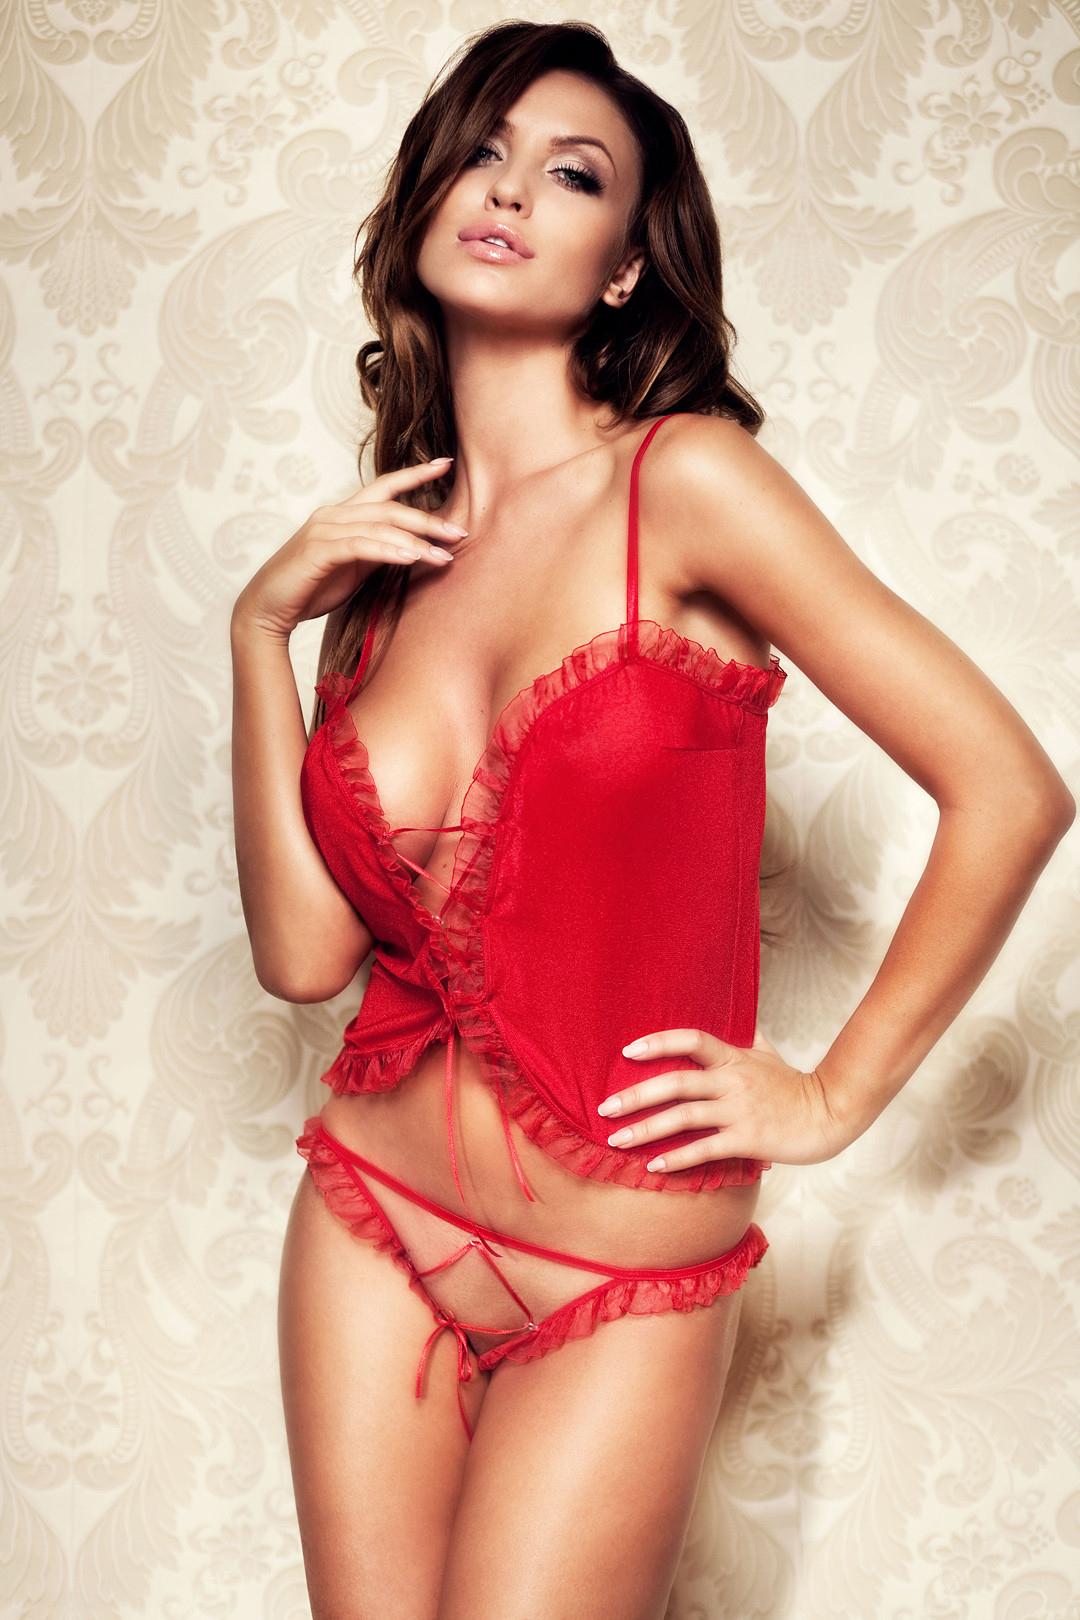 hot women wearing red lingerie - Monika Pietrasinska